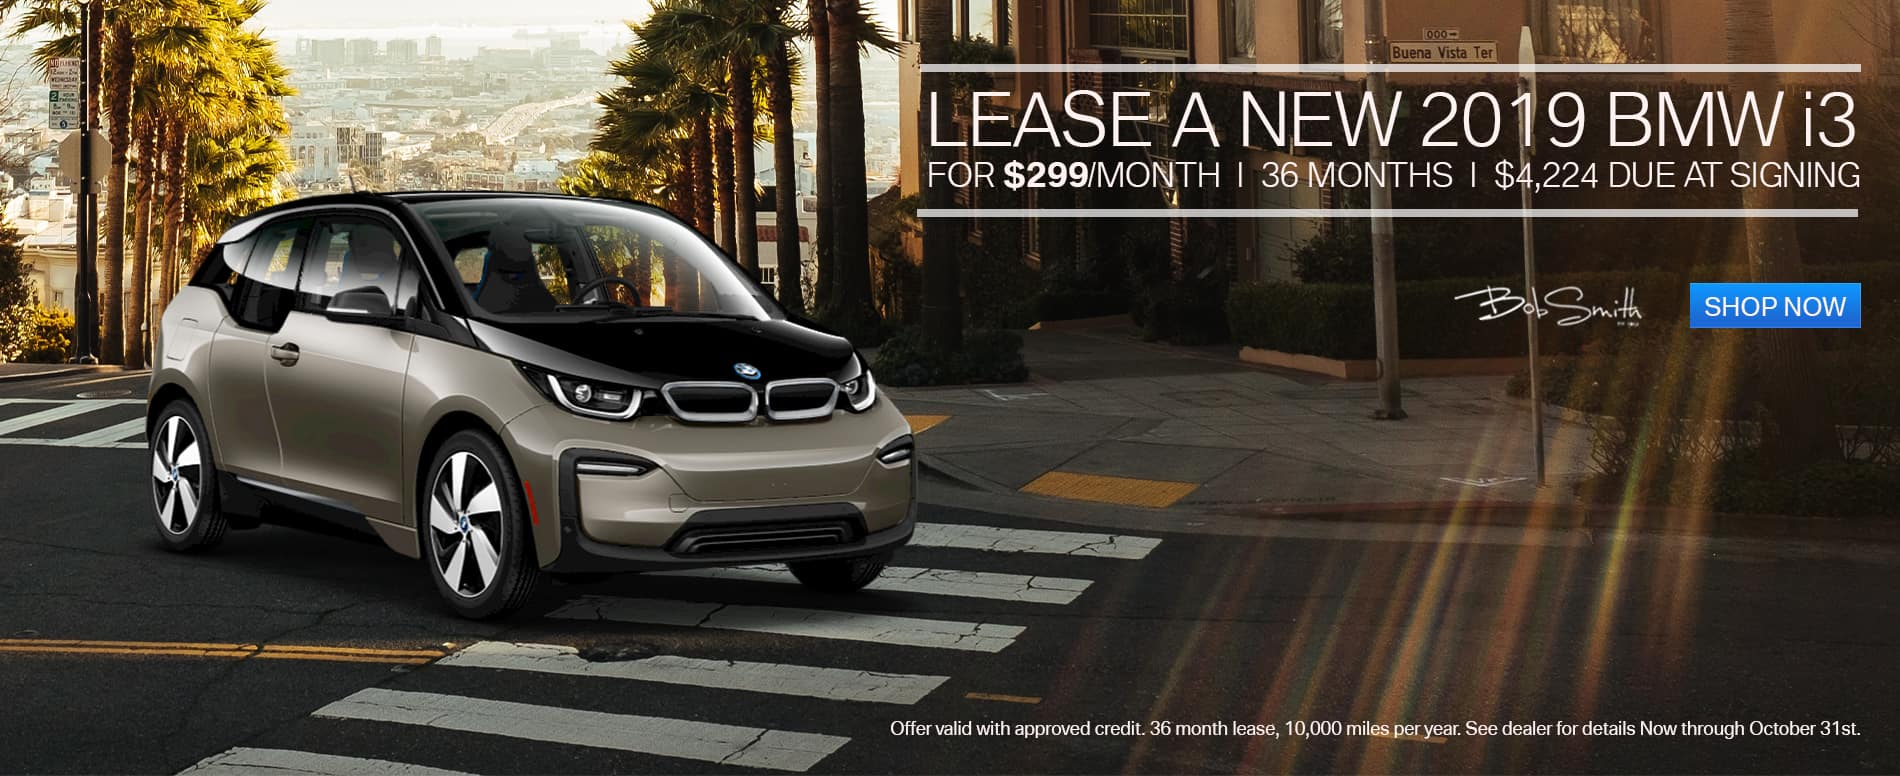 BMW New Car >> Bob Smith Bmw New Bmw And Used Car Dealer In Calabasas Ca